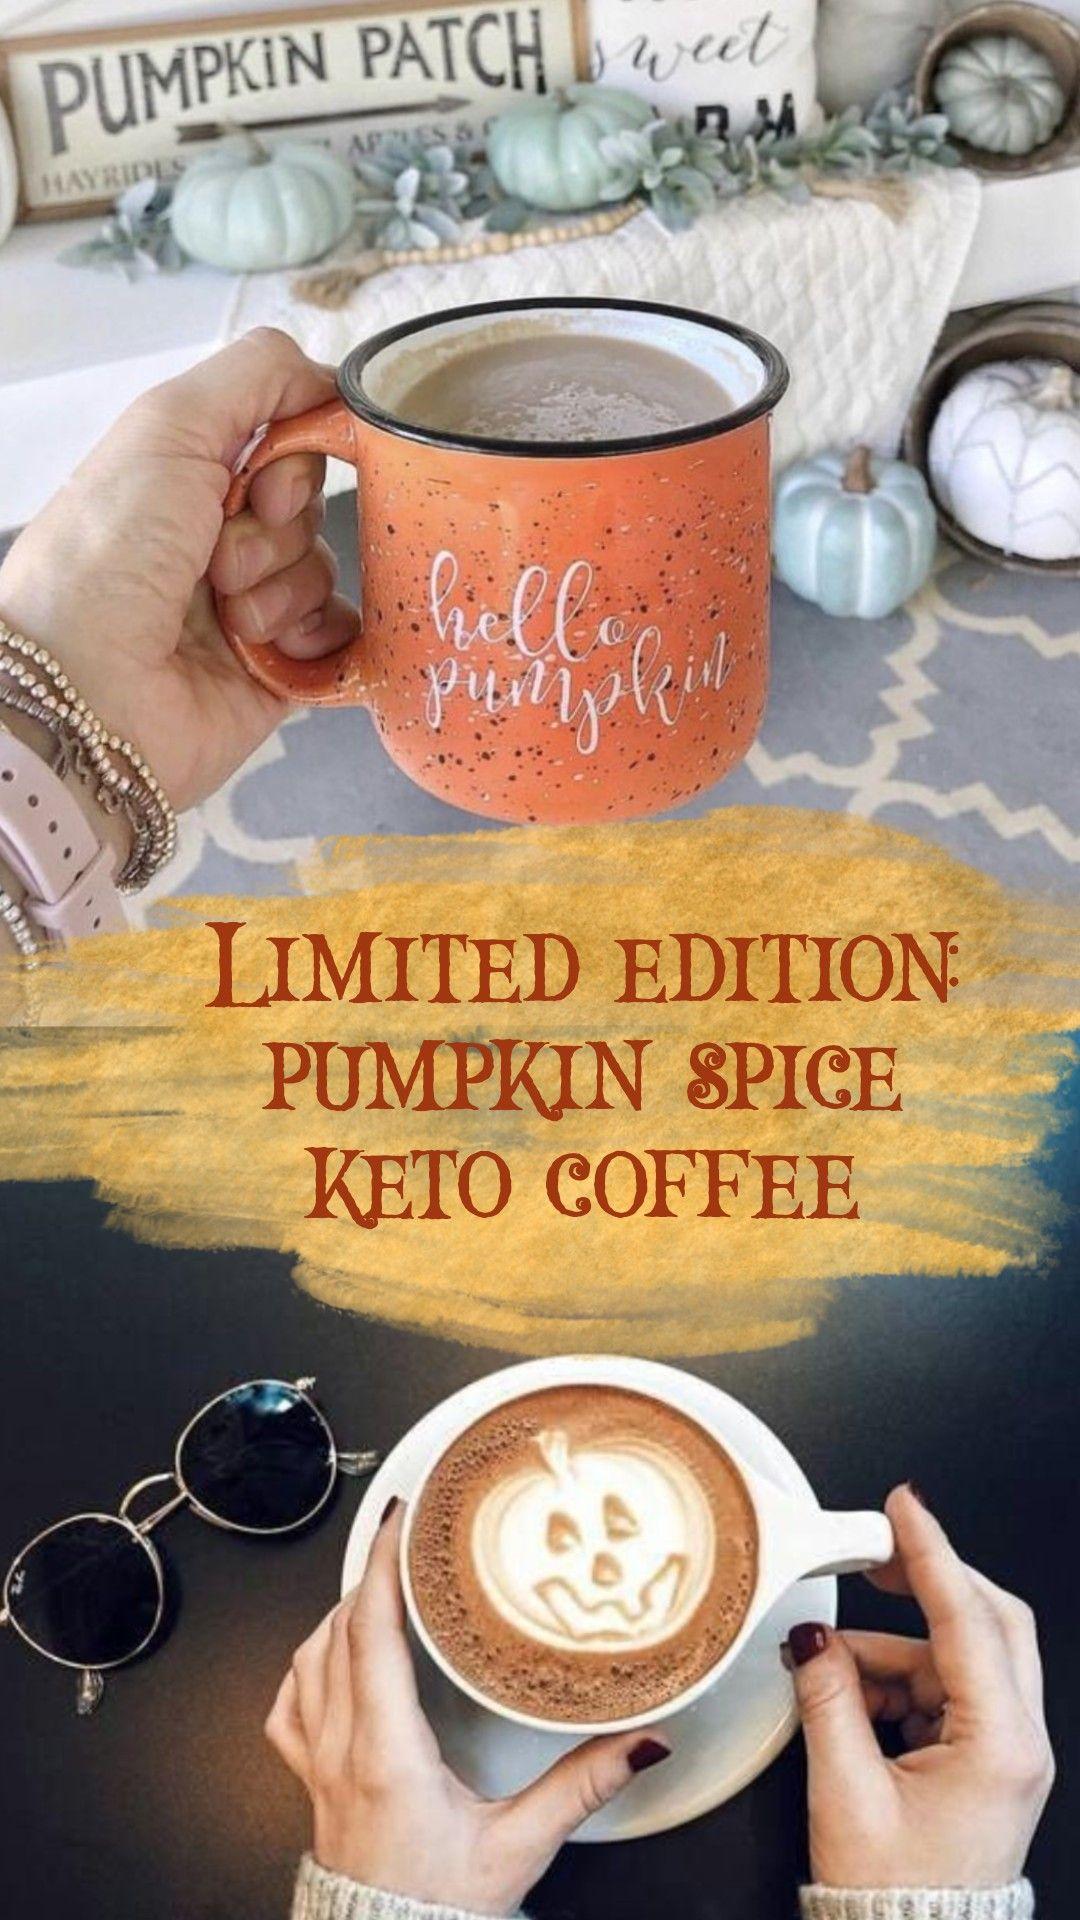 Keto Coffee, Pumpkin Spice, ItWorks #pumpkinspiceketocoffee